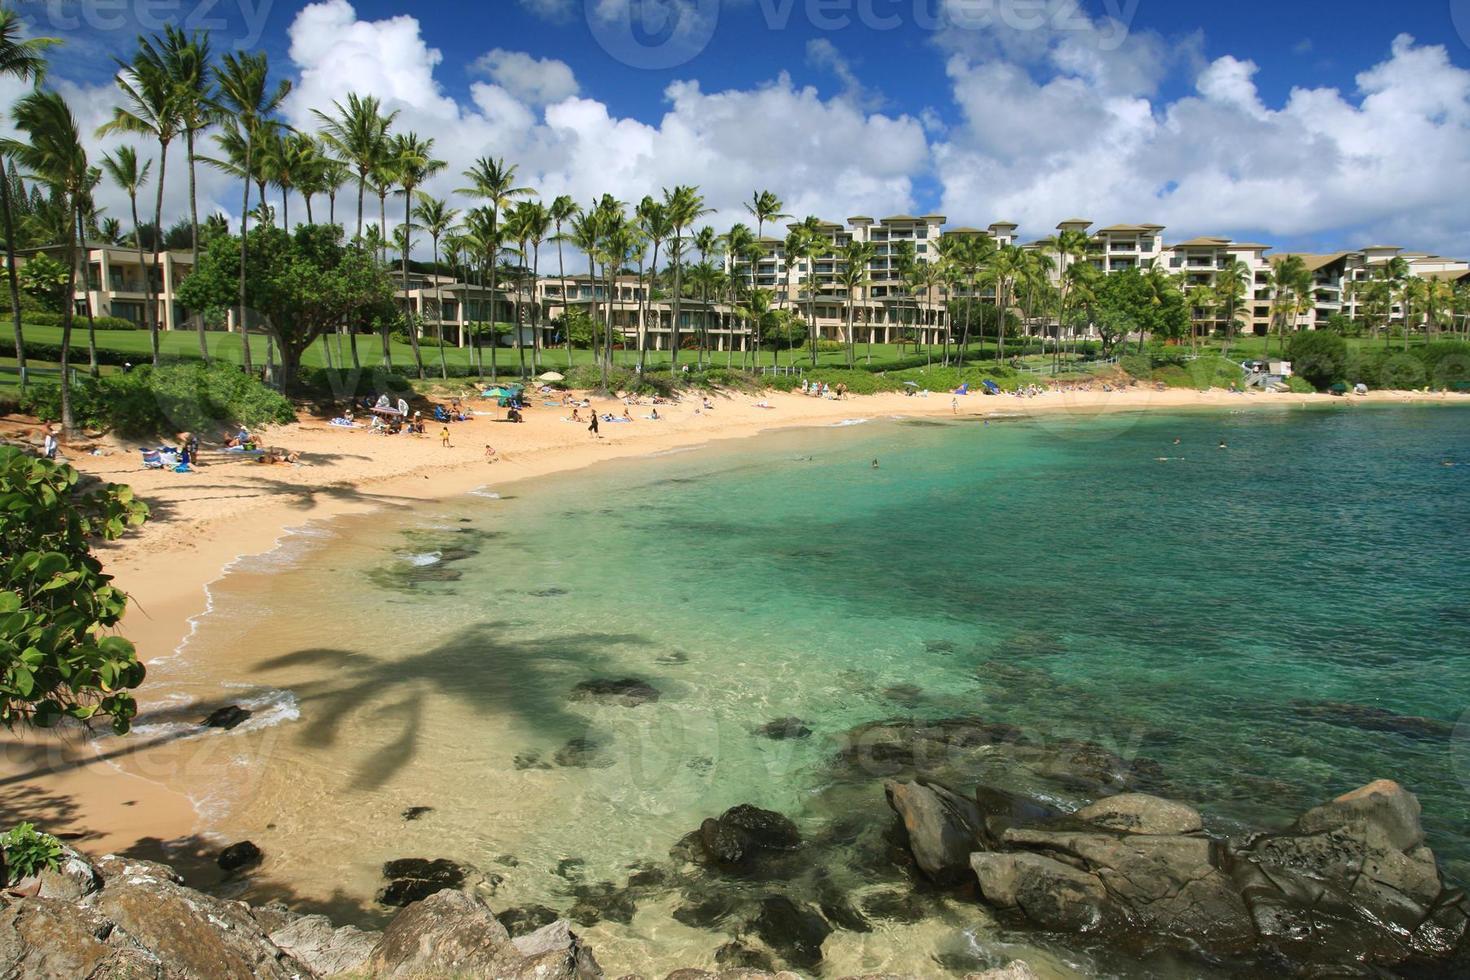 Maui Hawaii Pacific Ocean Beach Resort Hotelszene foto